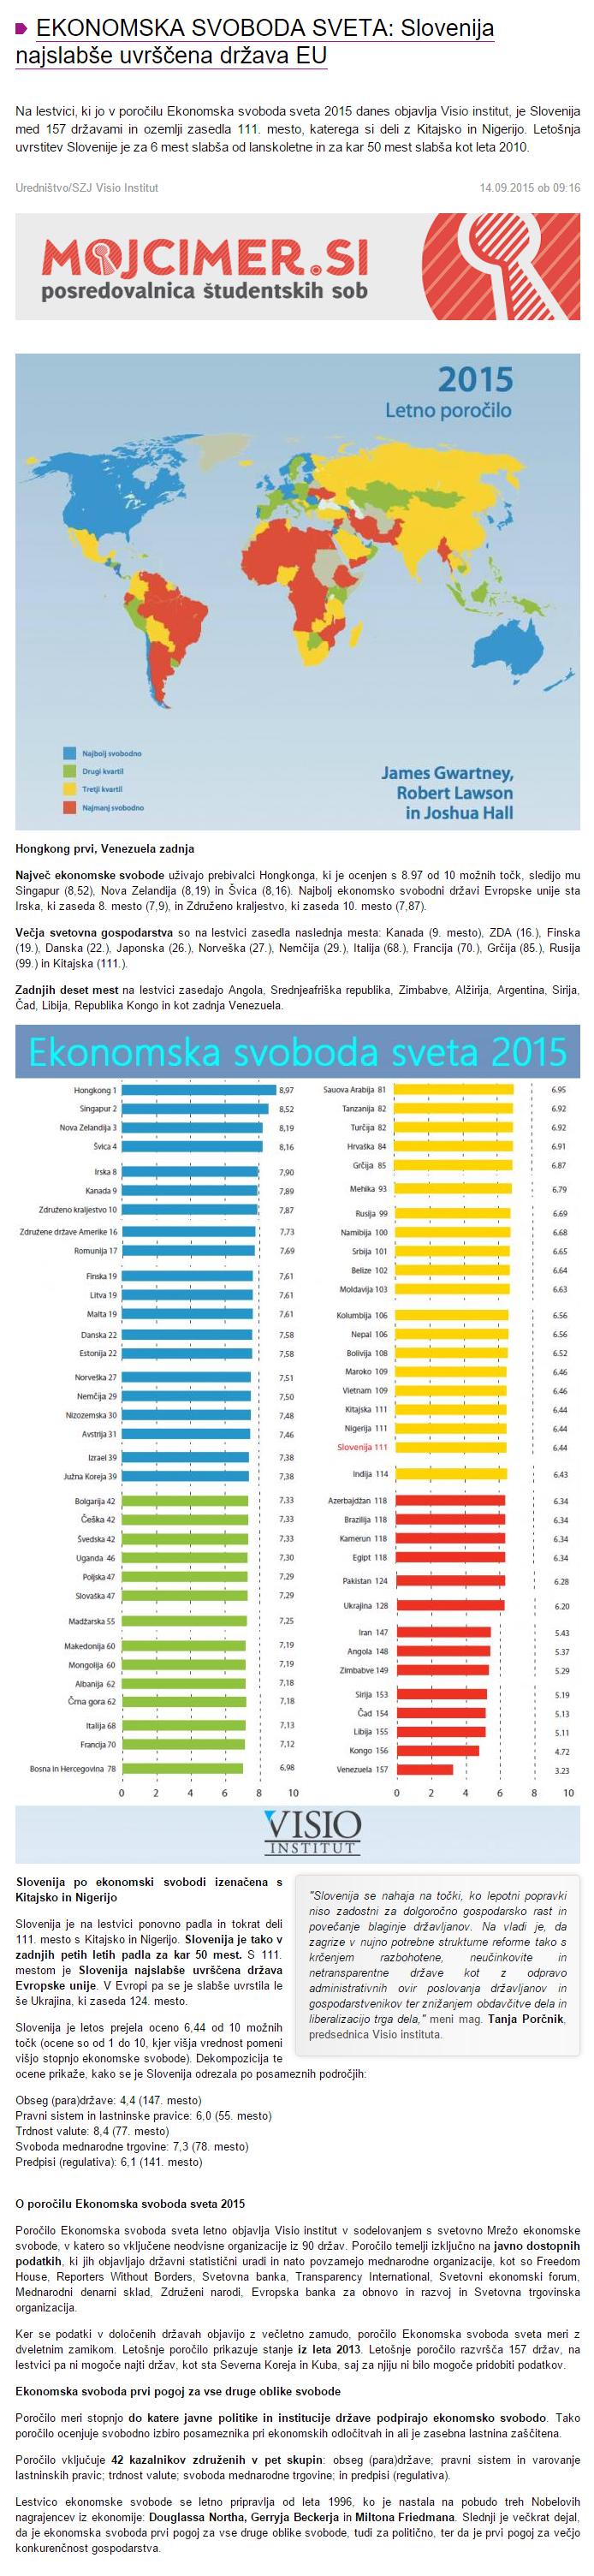 screencapture-www-regionalobala-si-novica-ekonomska-svoboda-sveta-2015-1443092517354